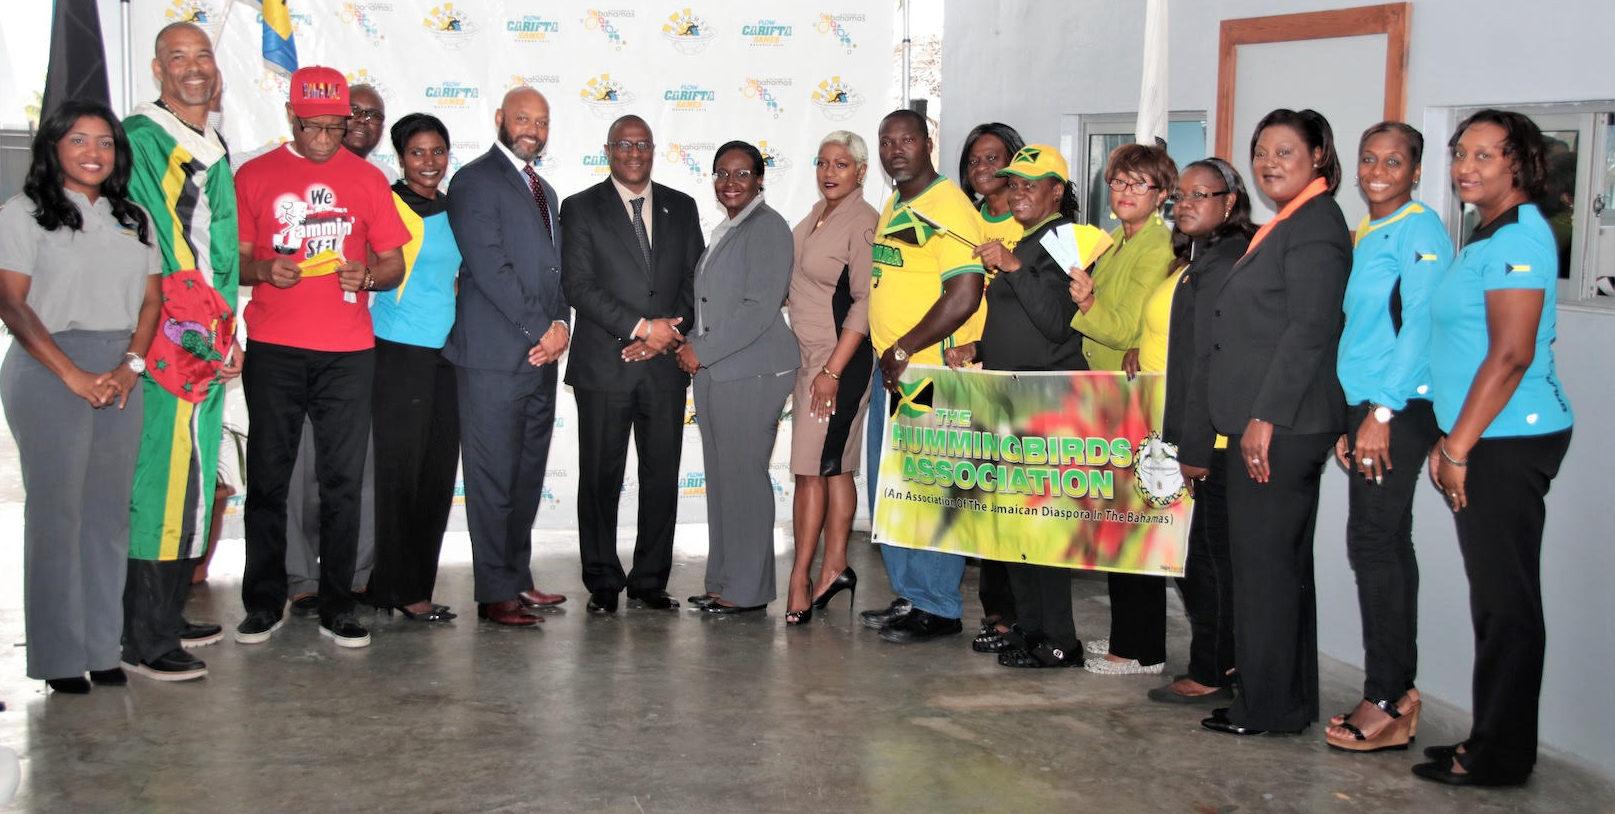 CARIFTA 2018 ticket sales launched